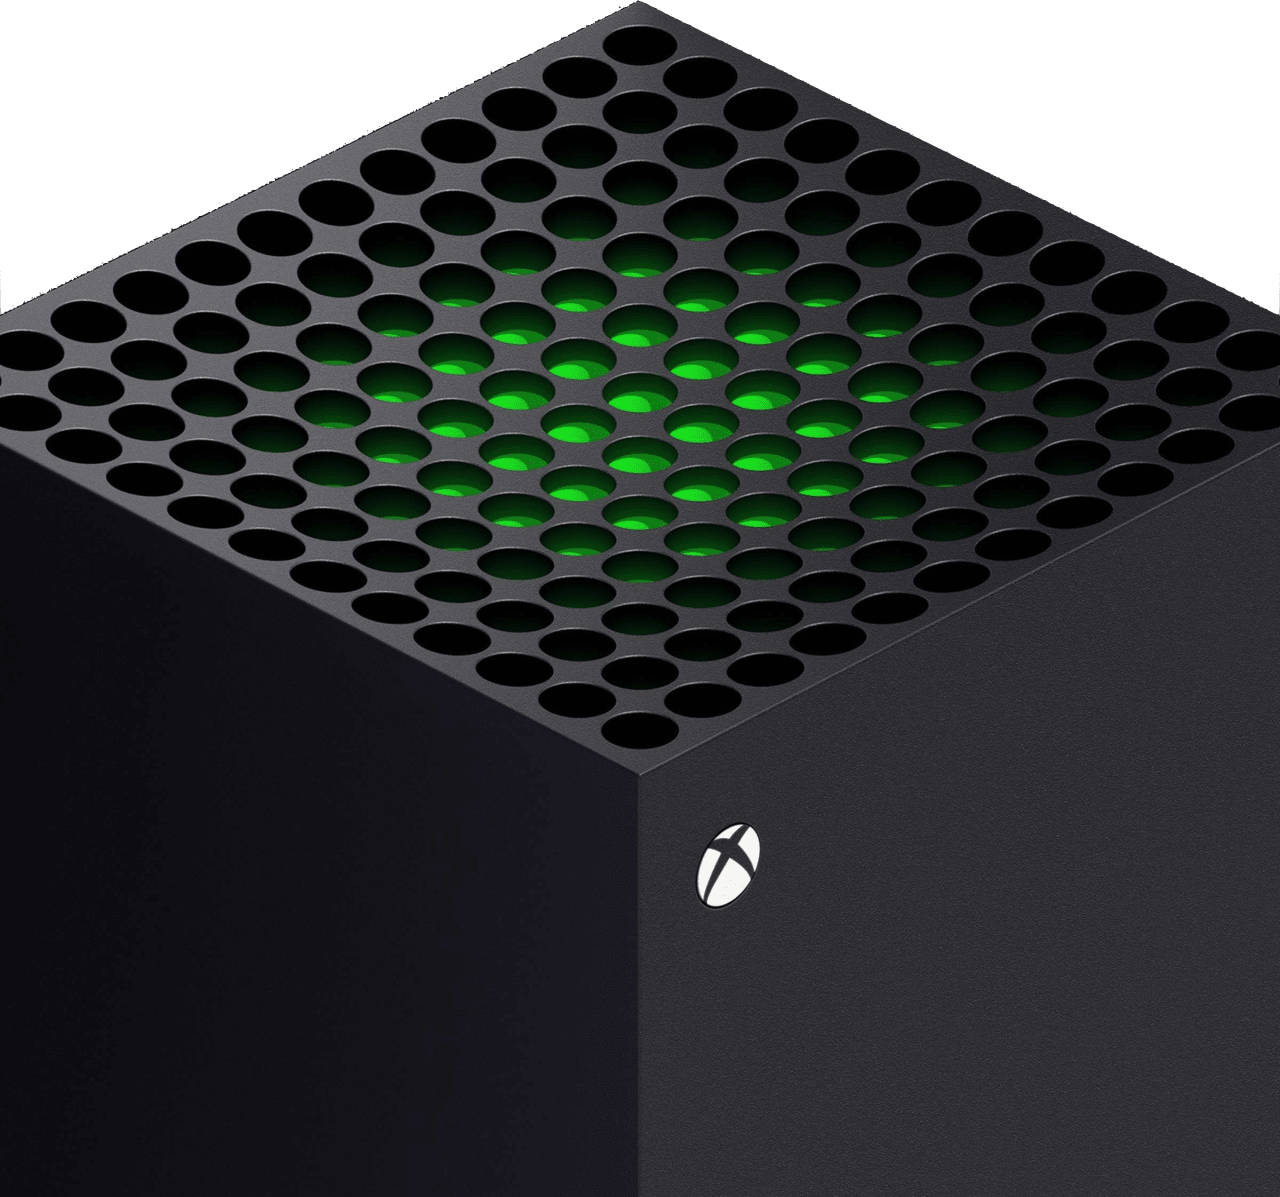 Black Microsoft Xbox Series X.3